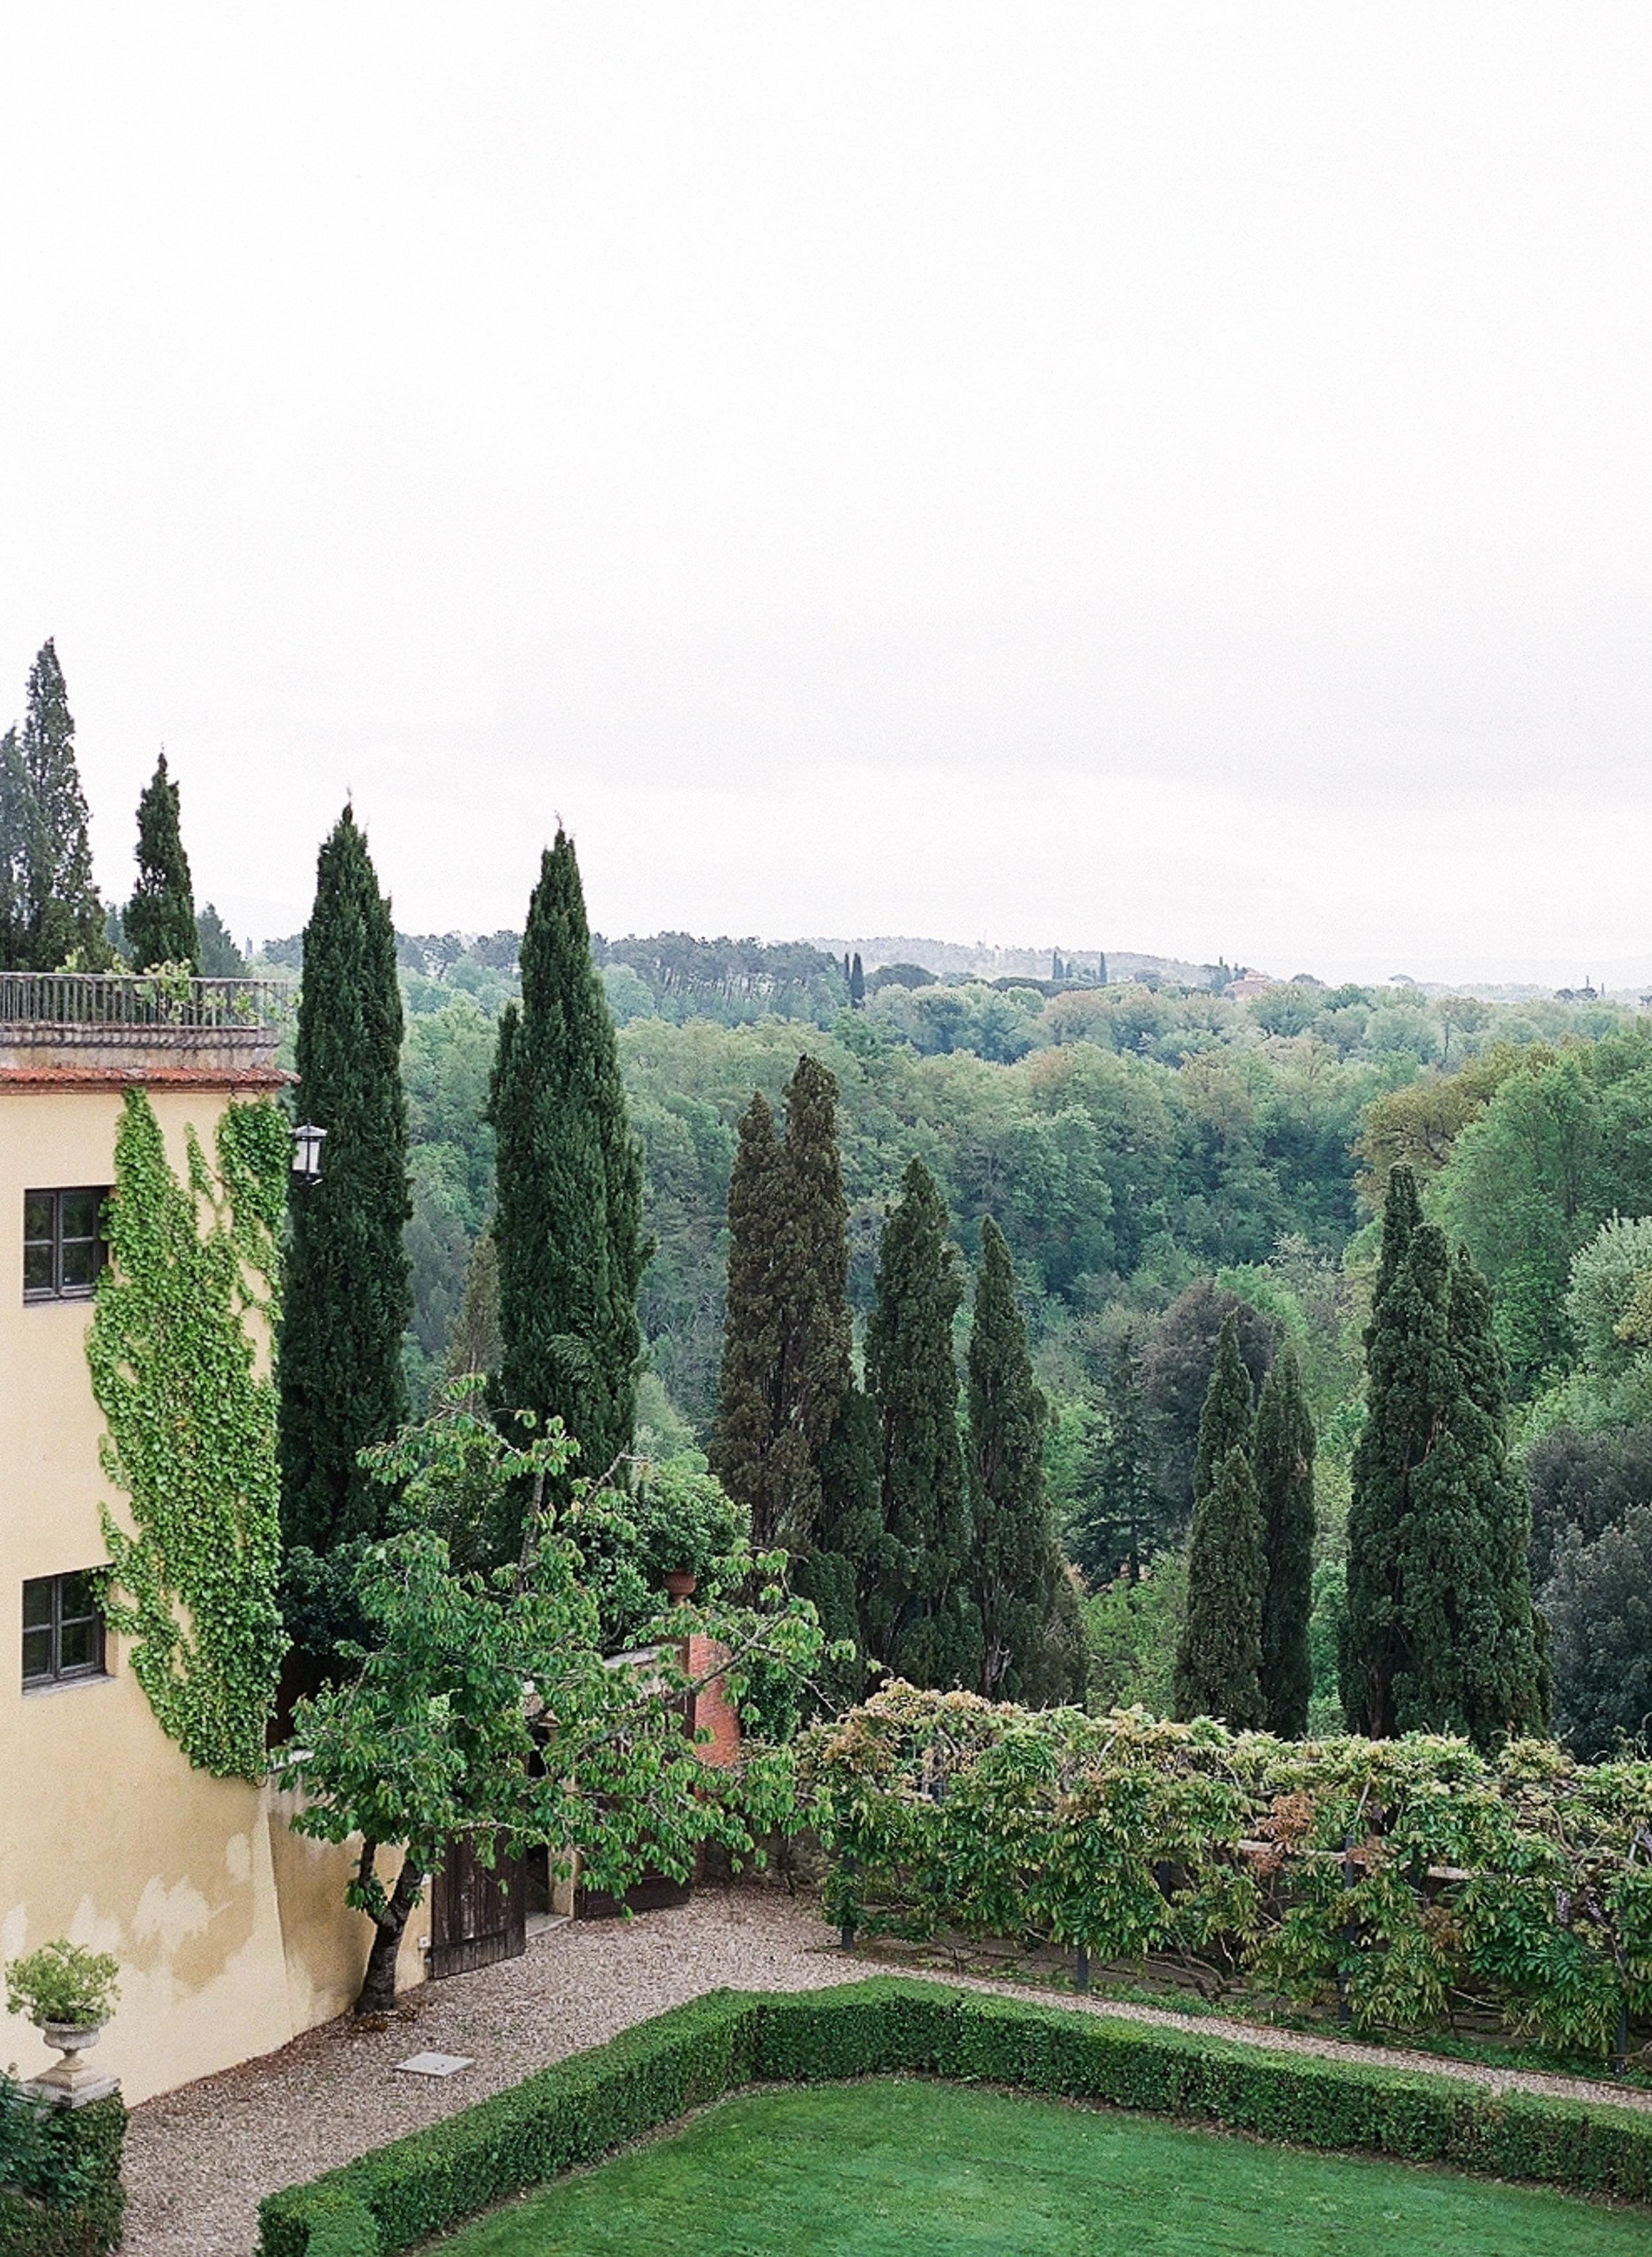 Bonphotage Chicago and Destination Fine Art Wedding Photography - Italy, Il Borro